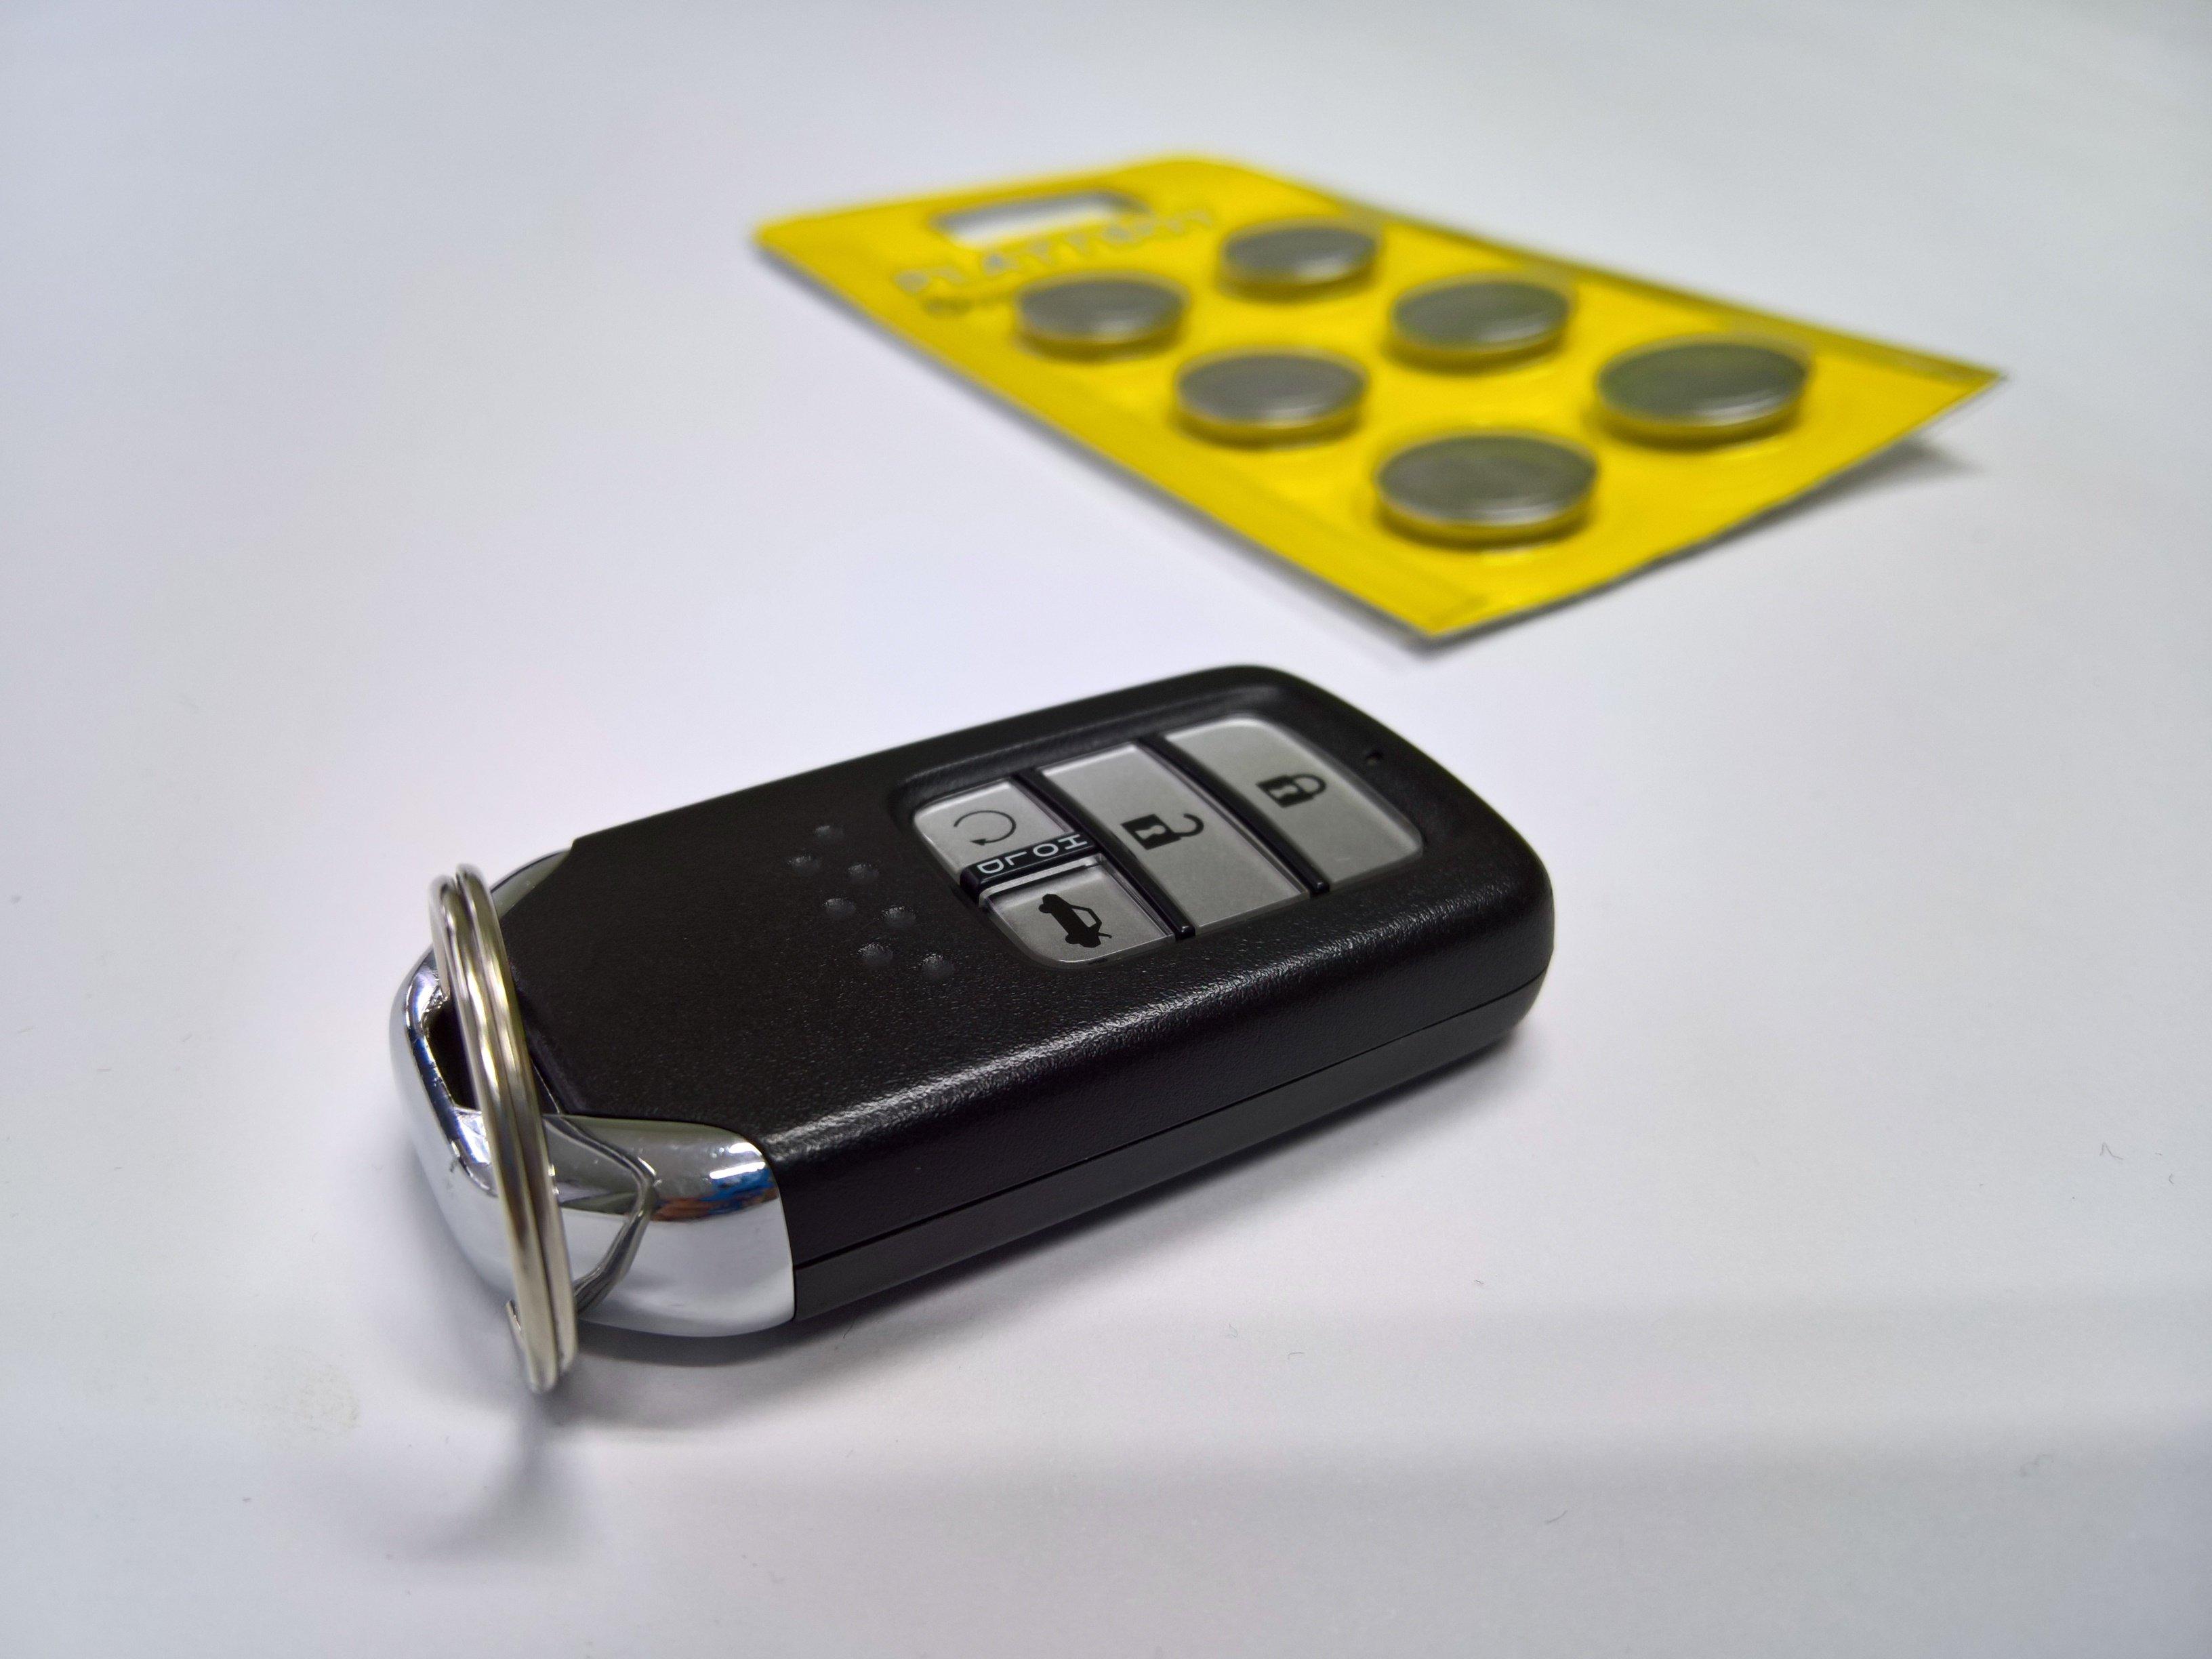 Honda Civic 2016 Keyless Remote Battery Replacement Ifixit Repair Guide